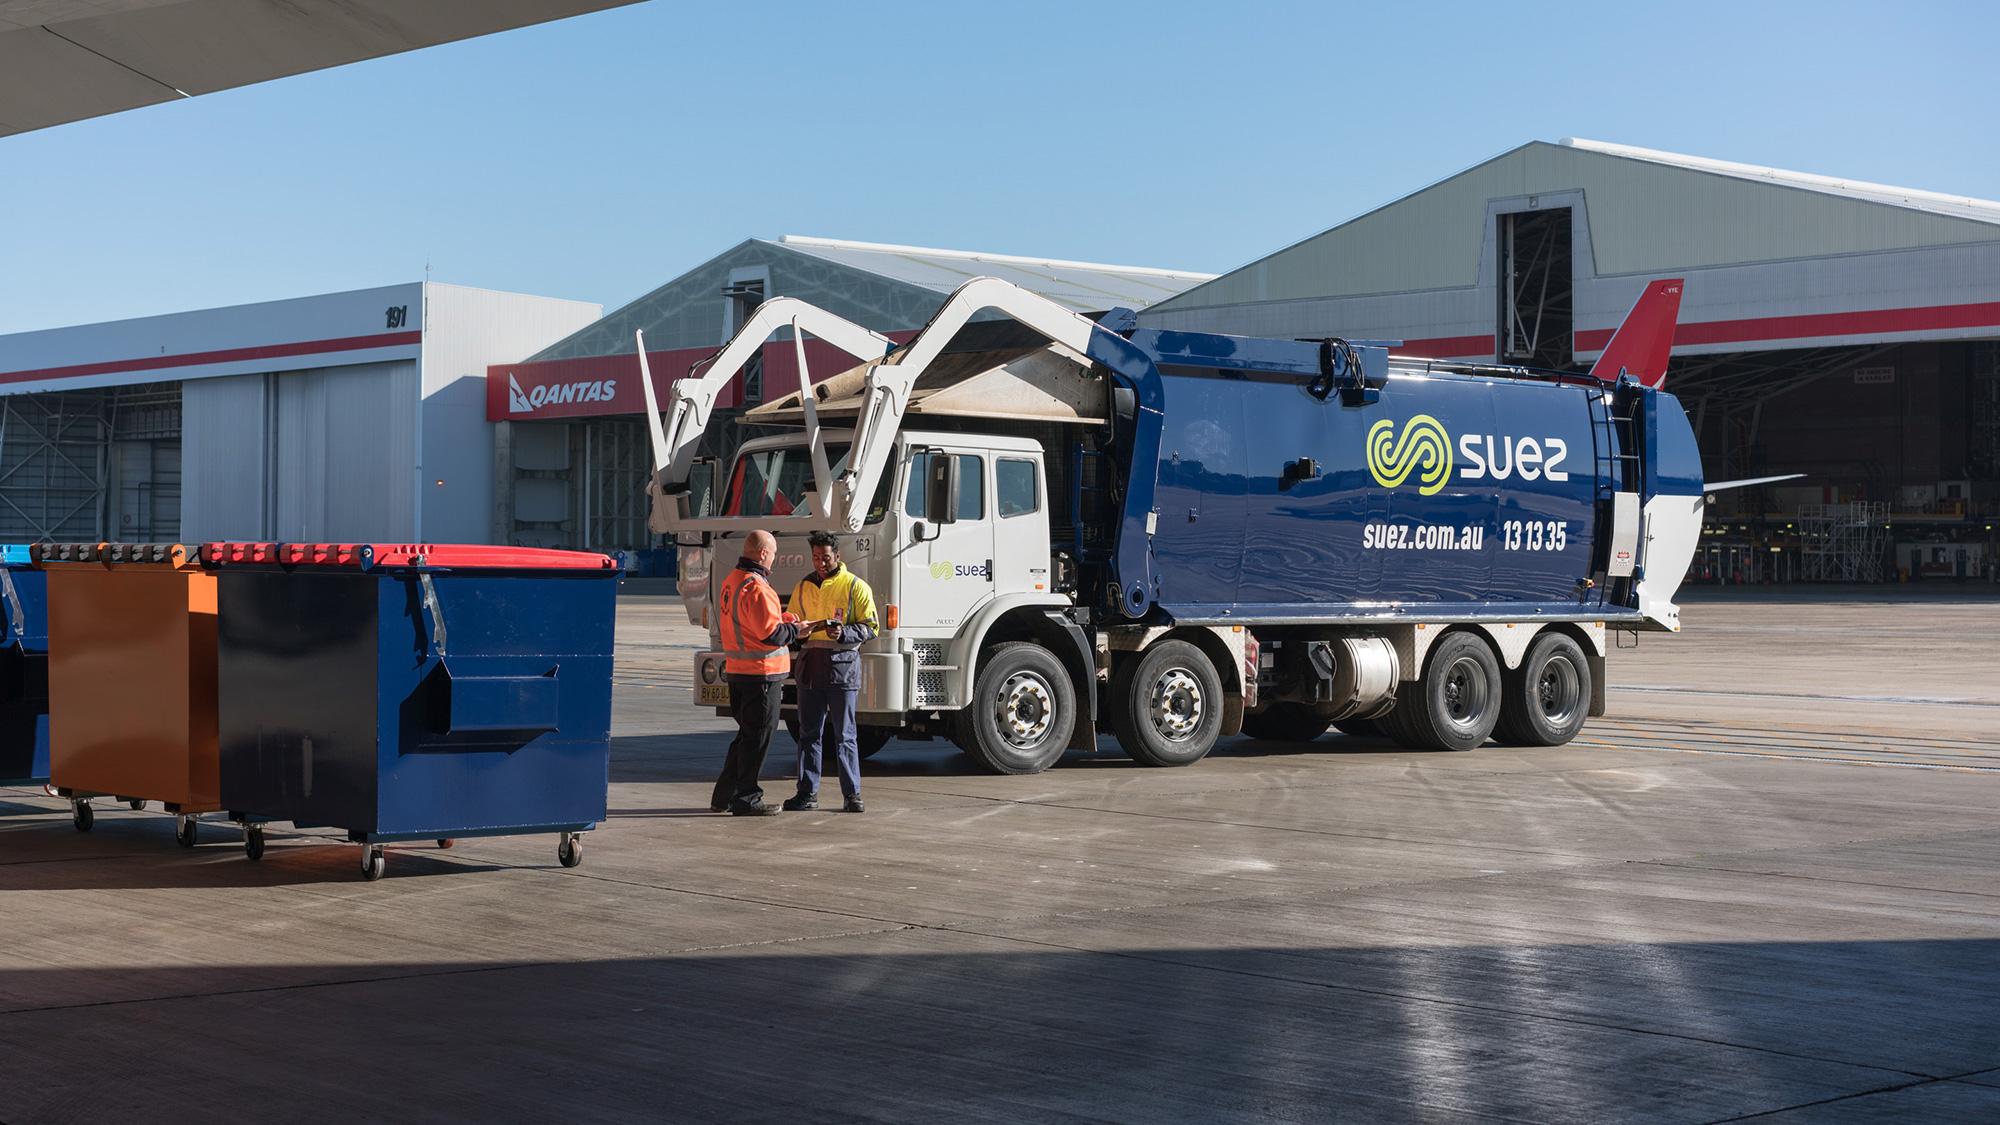 SUEZ truck in Qantas hangar